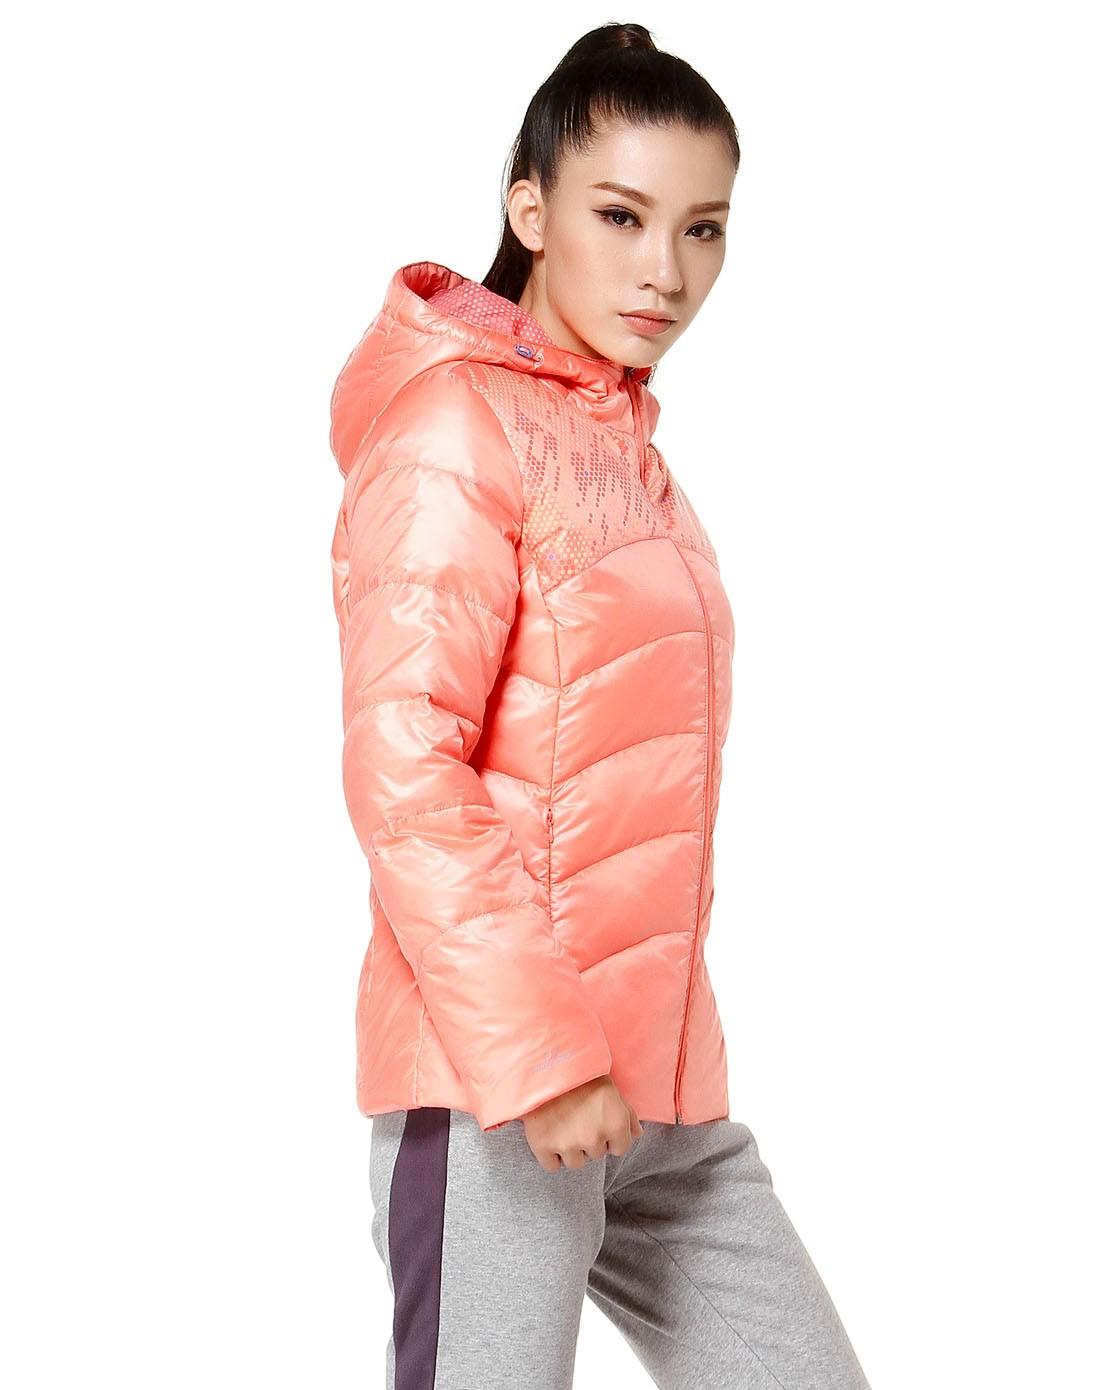 Manteau de sport femme LINING AYMH026-1 - Ref 505531 Image 8